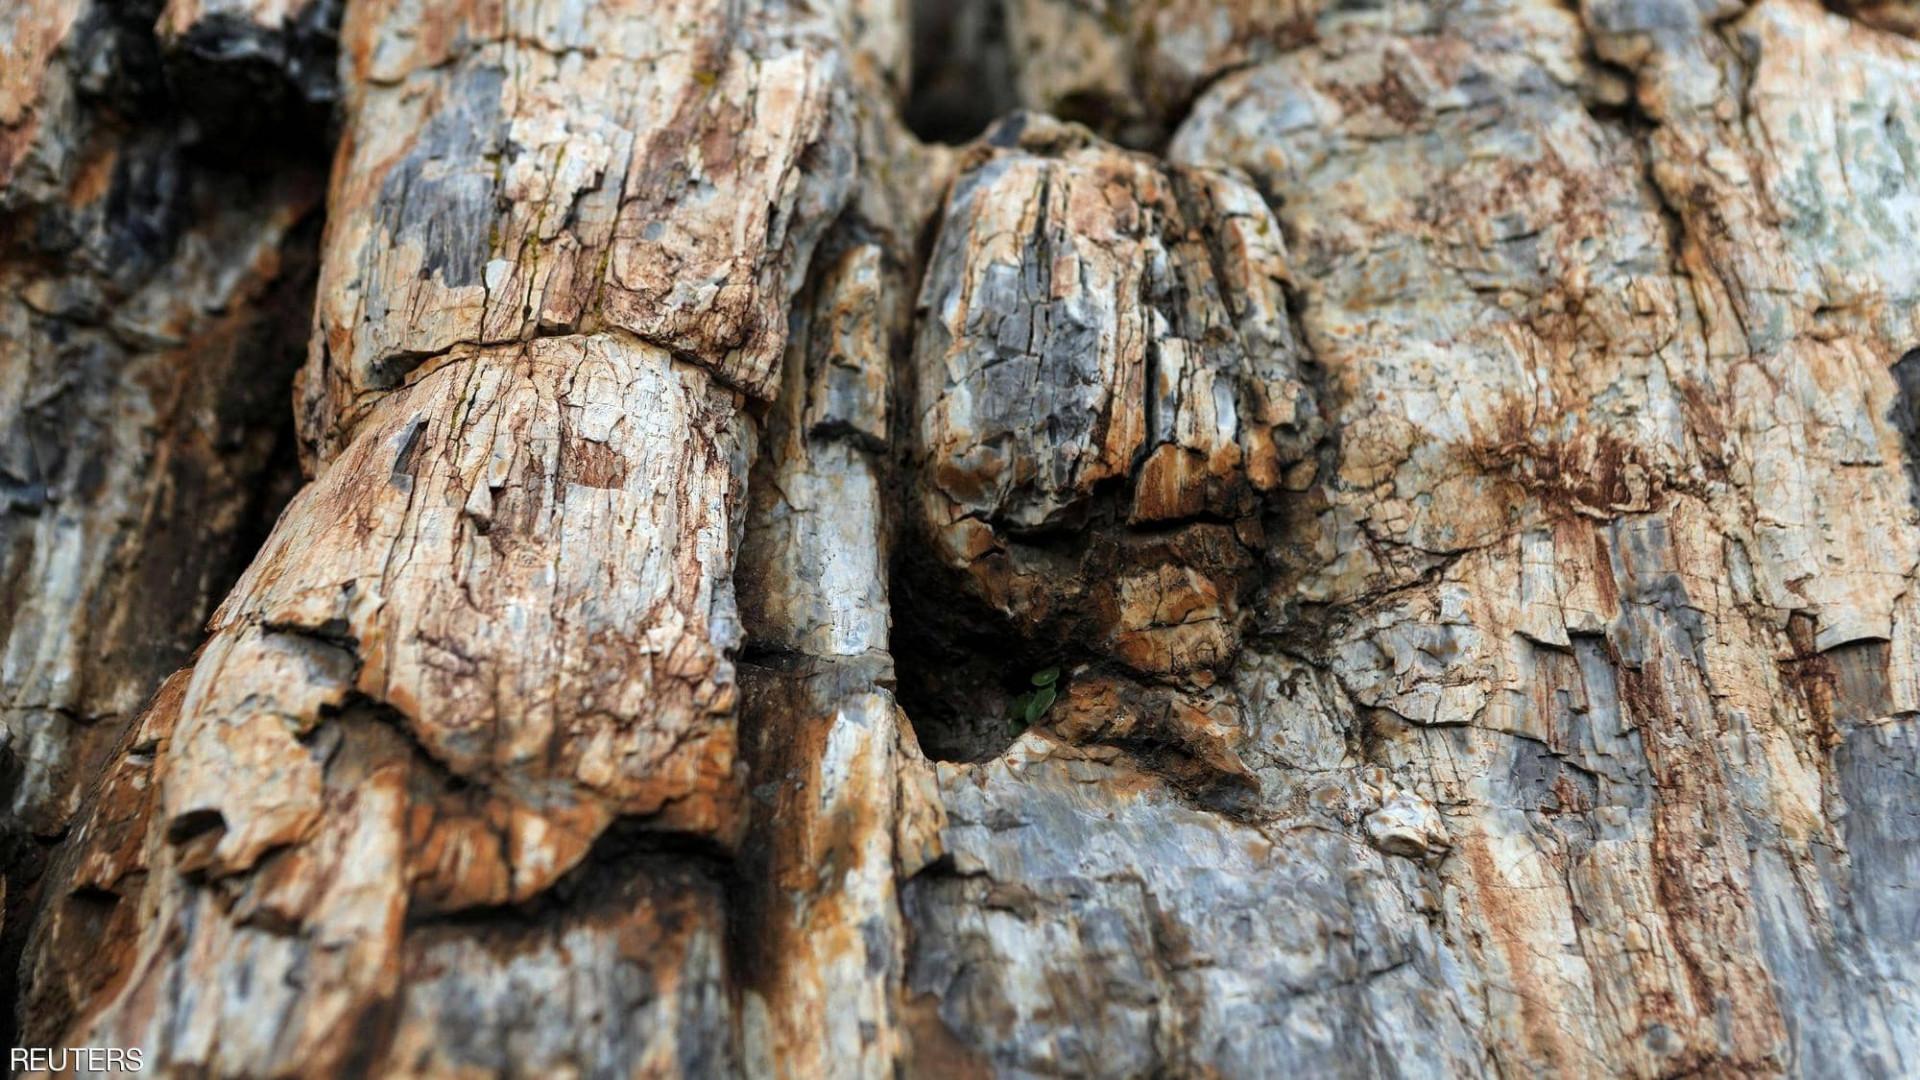 اكتشاف نادر ومذهل.. شجرة عمرها 20 مليون عام (صور)